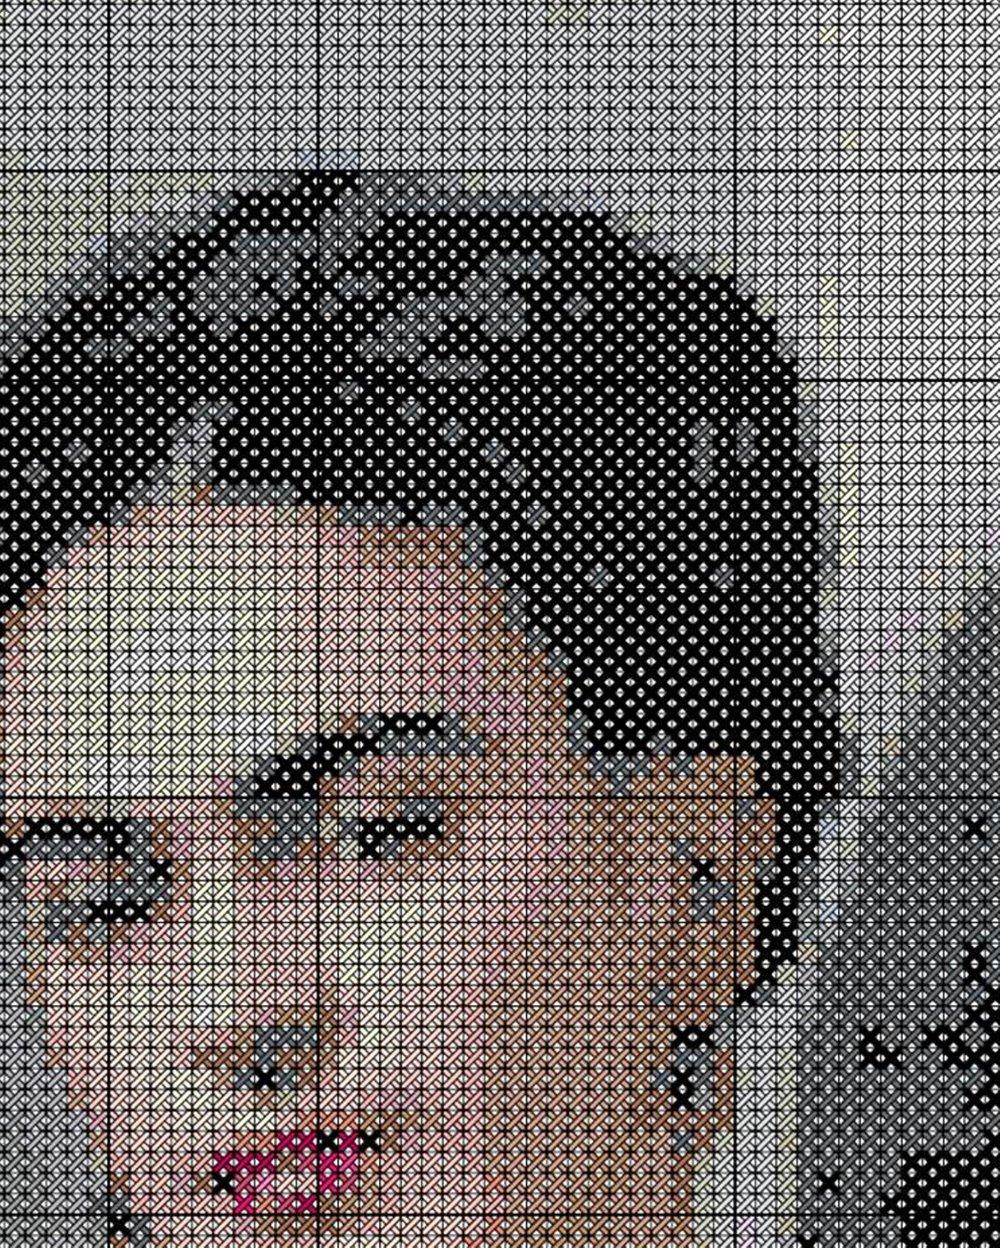 FK-Stitches-image.jpg